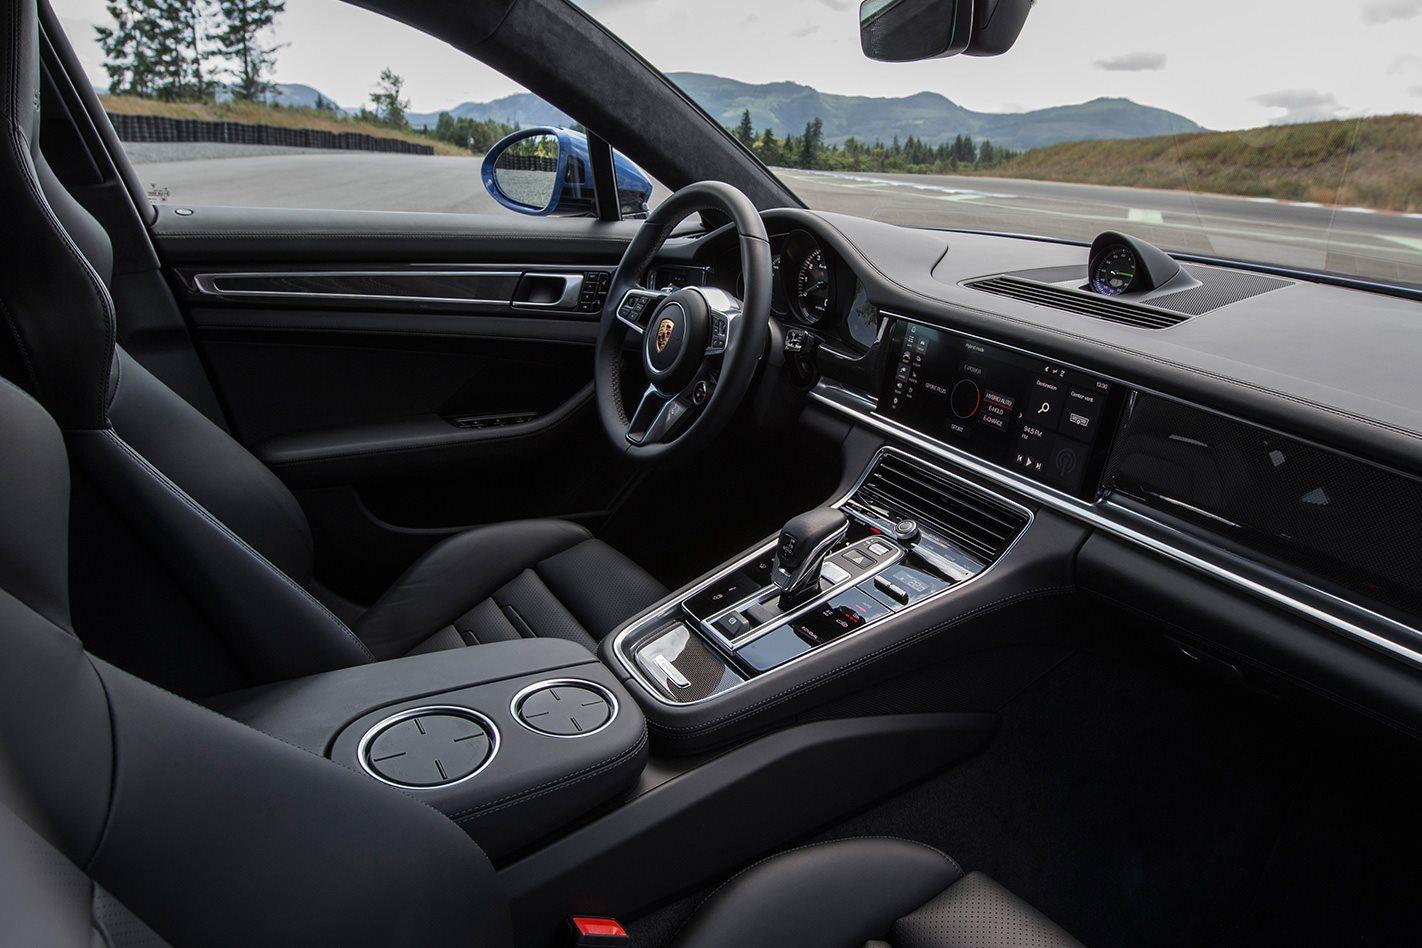 2018 Porsche Panamera Turbo S E Hybrid Review Motor